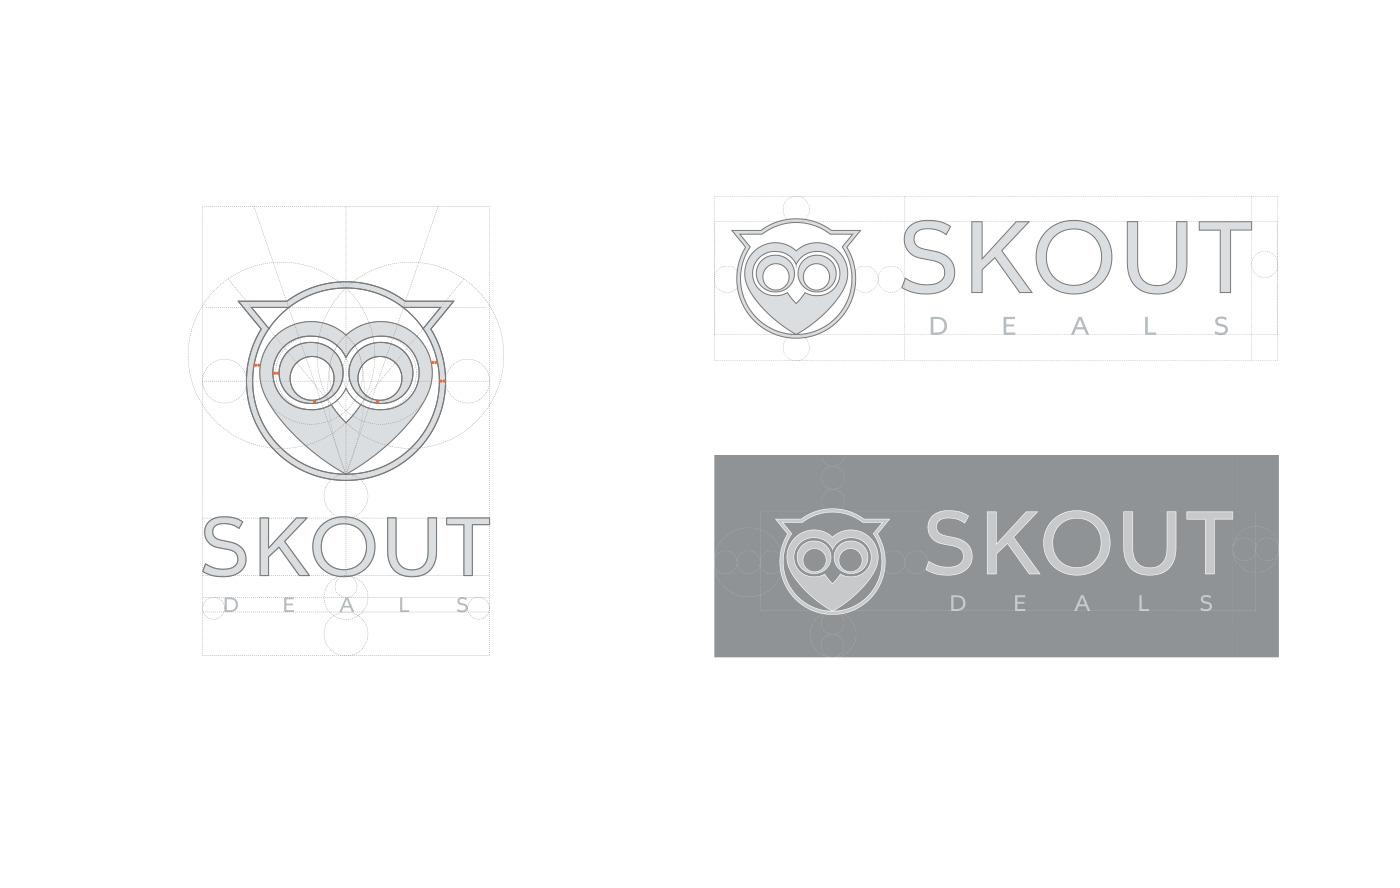 skout deals logo grid